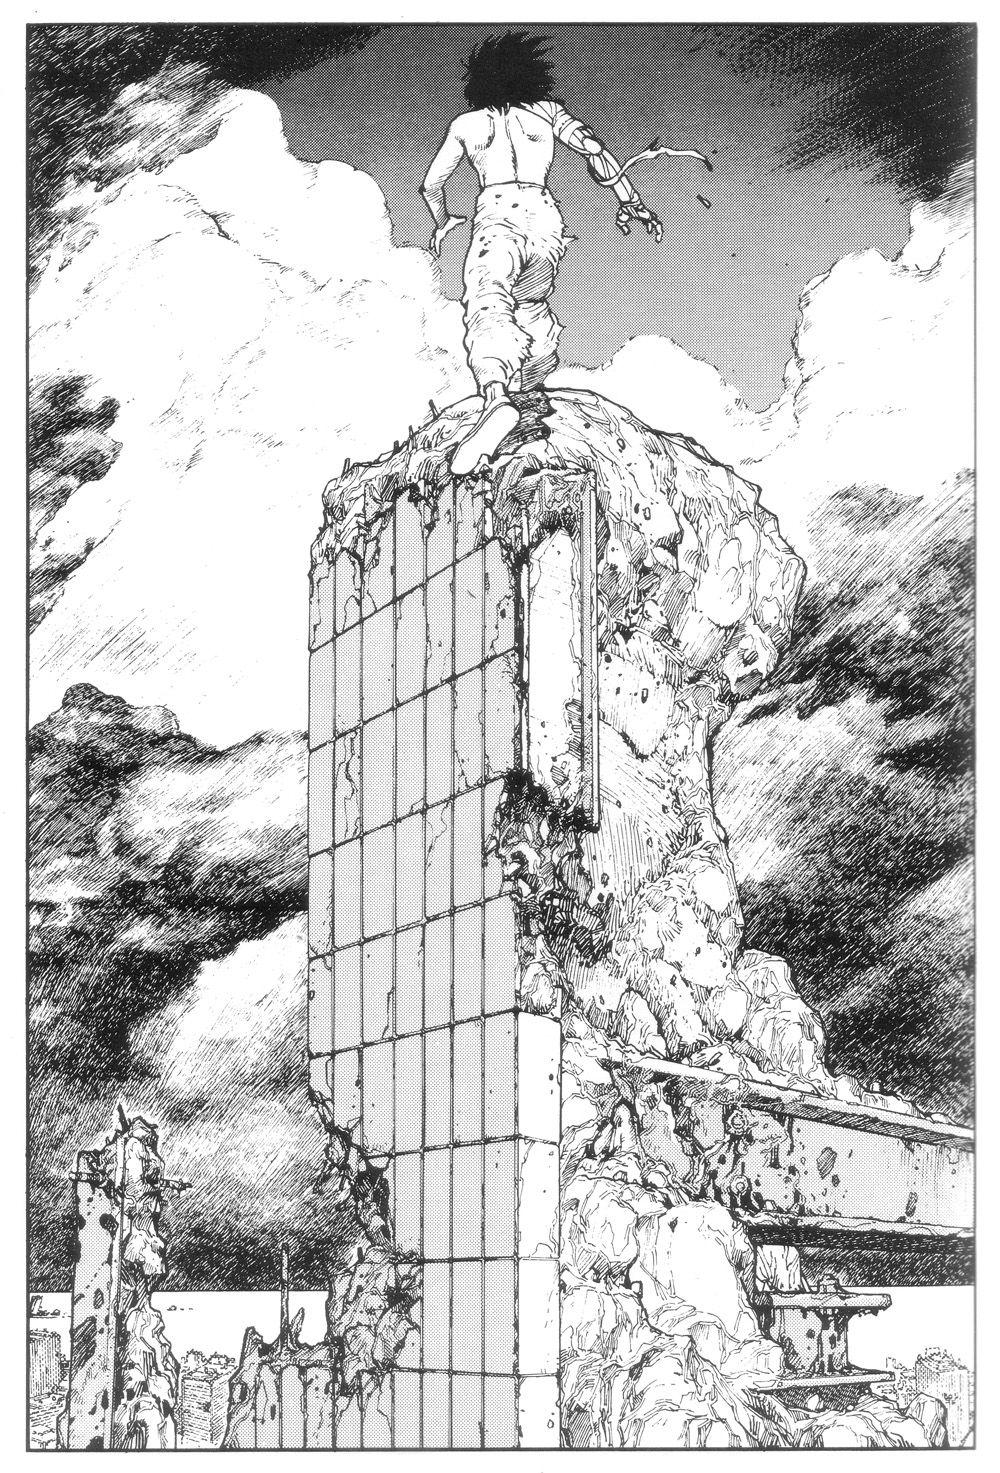 Rhade Zapan Akira Panel By Katsuhiro Otomo More Akira Arte Renacentista Pintura Referencia De Arte Y Dibujo Manga